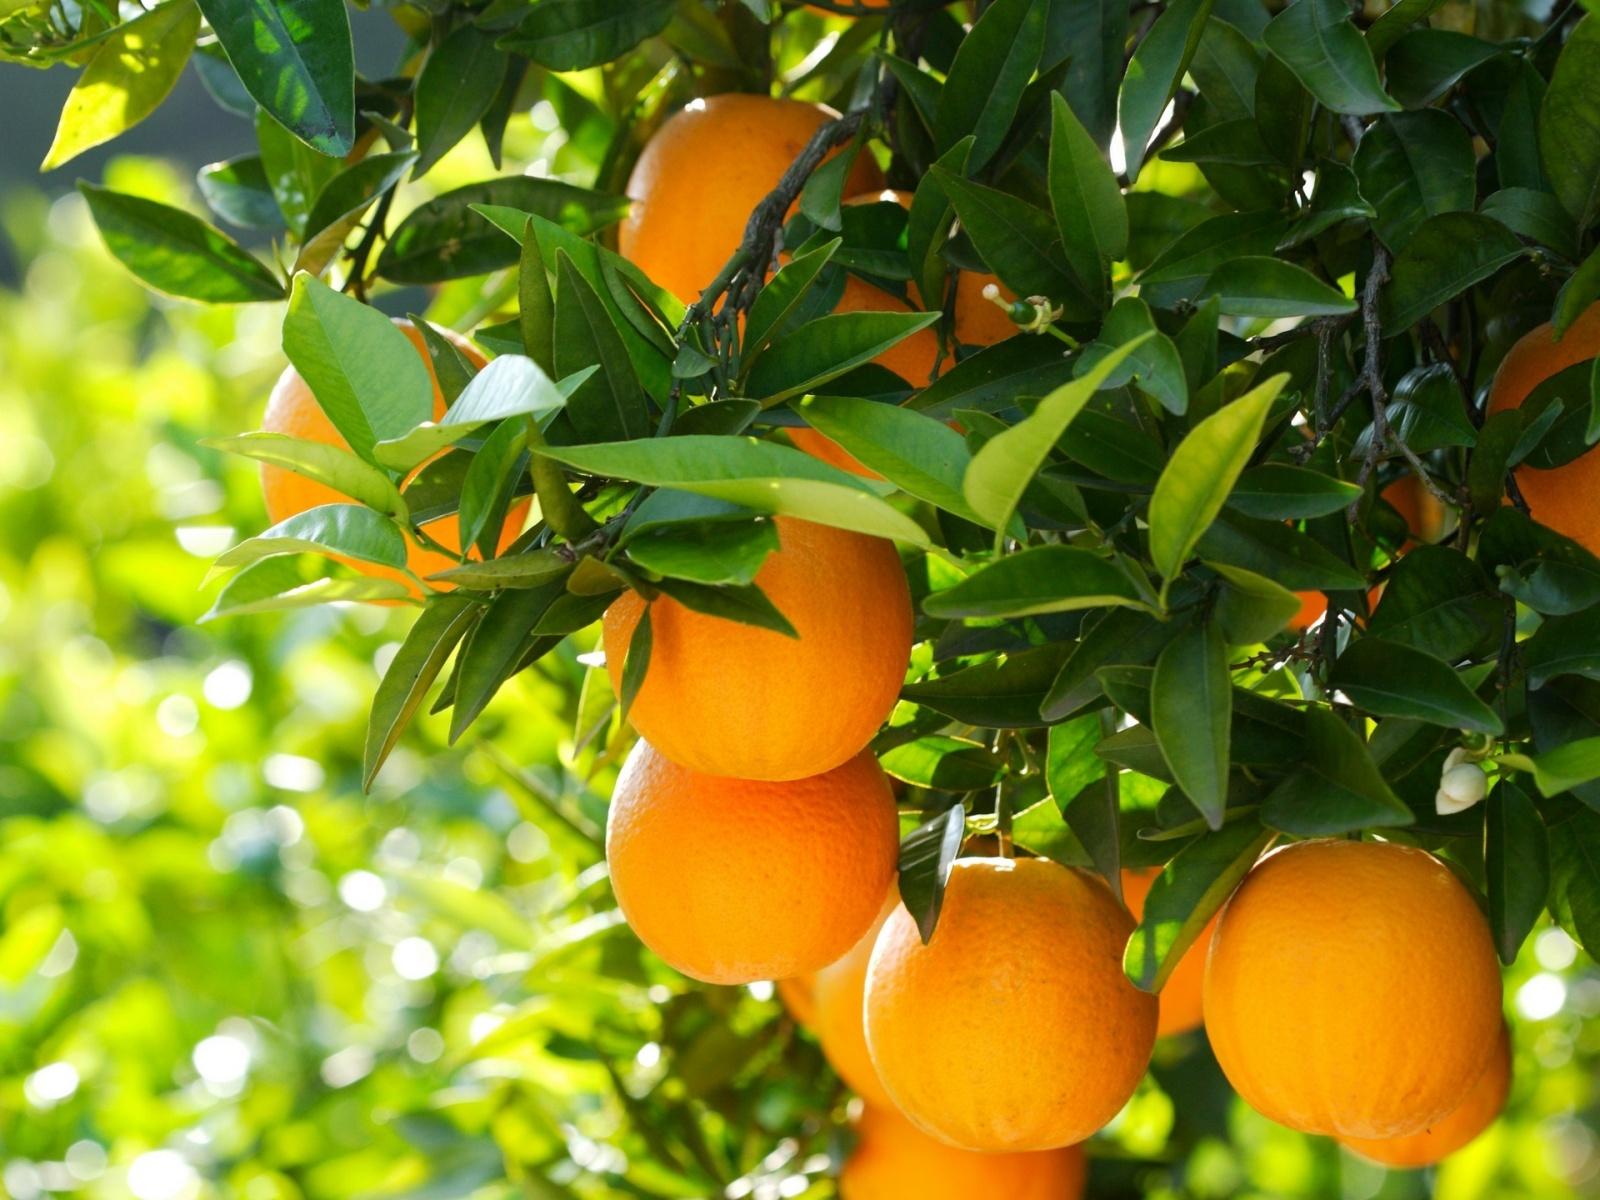 priroda-apelsiny-derevo